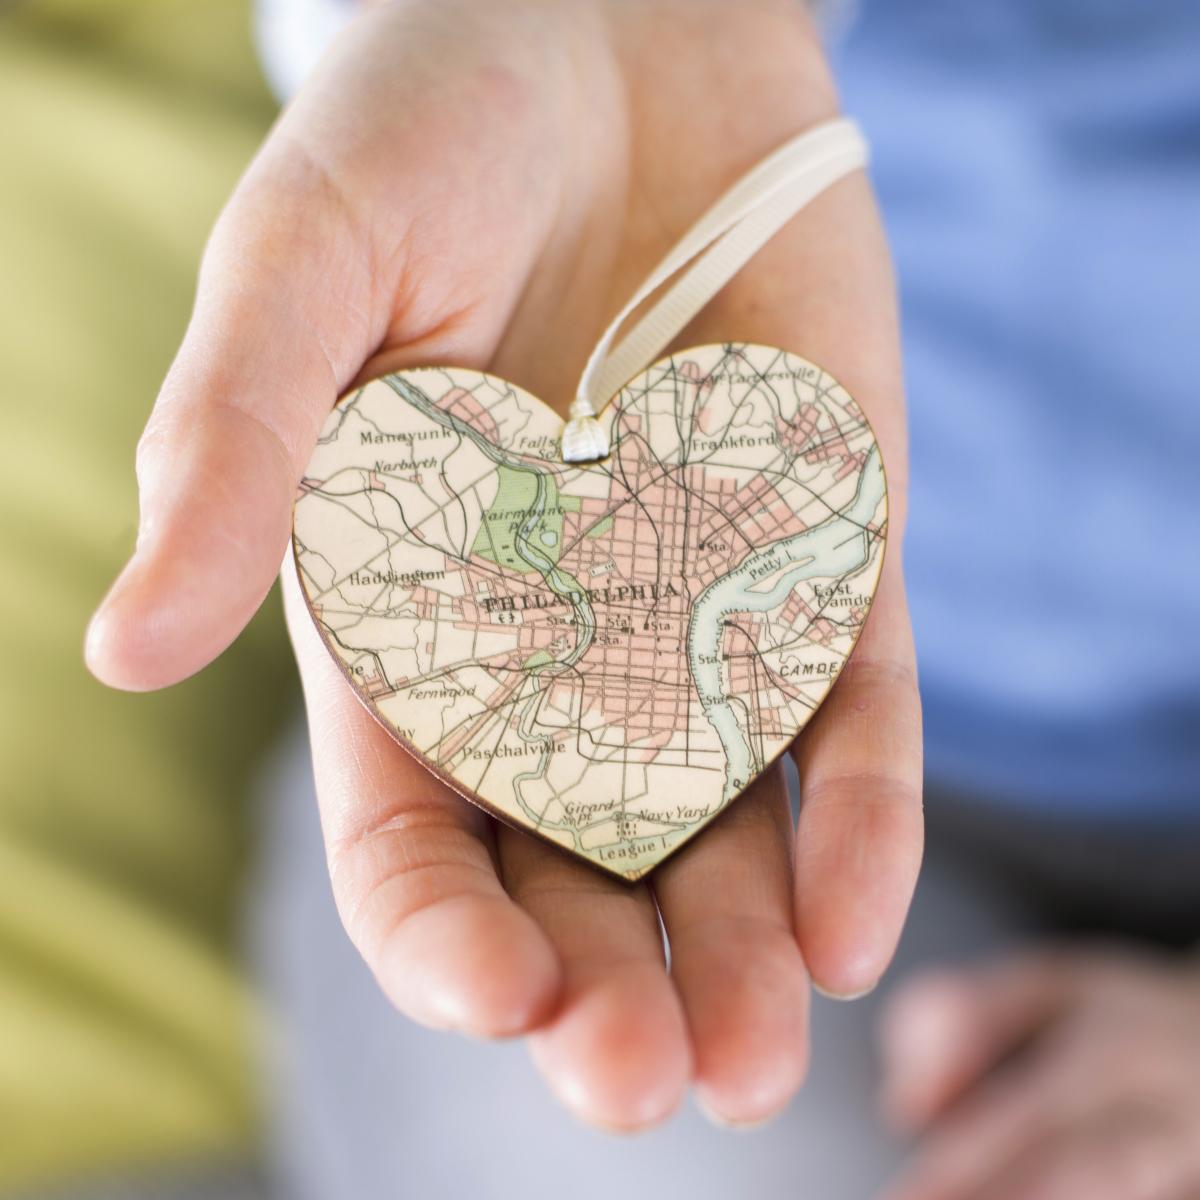 A hanging heart map keepsake thank you gift